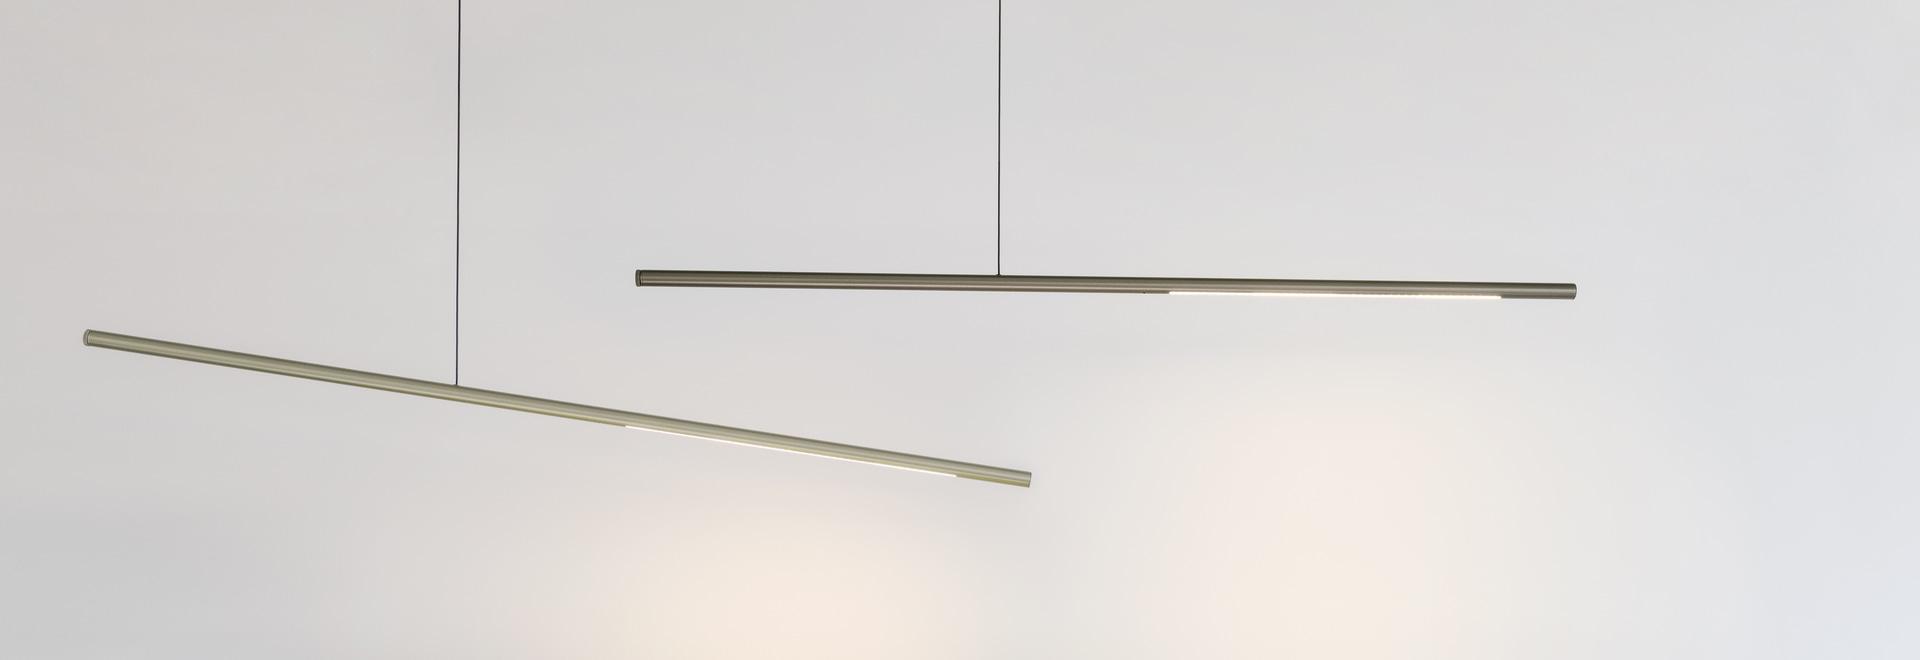 PALITO - new linear LED luminaire creation of SATTLER - pendant light